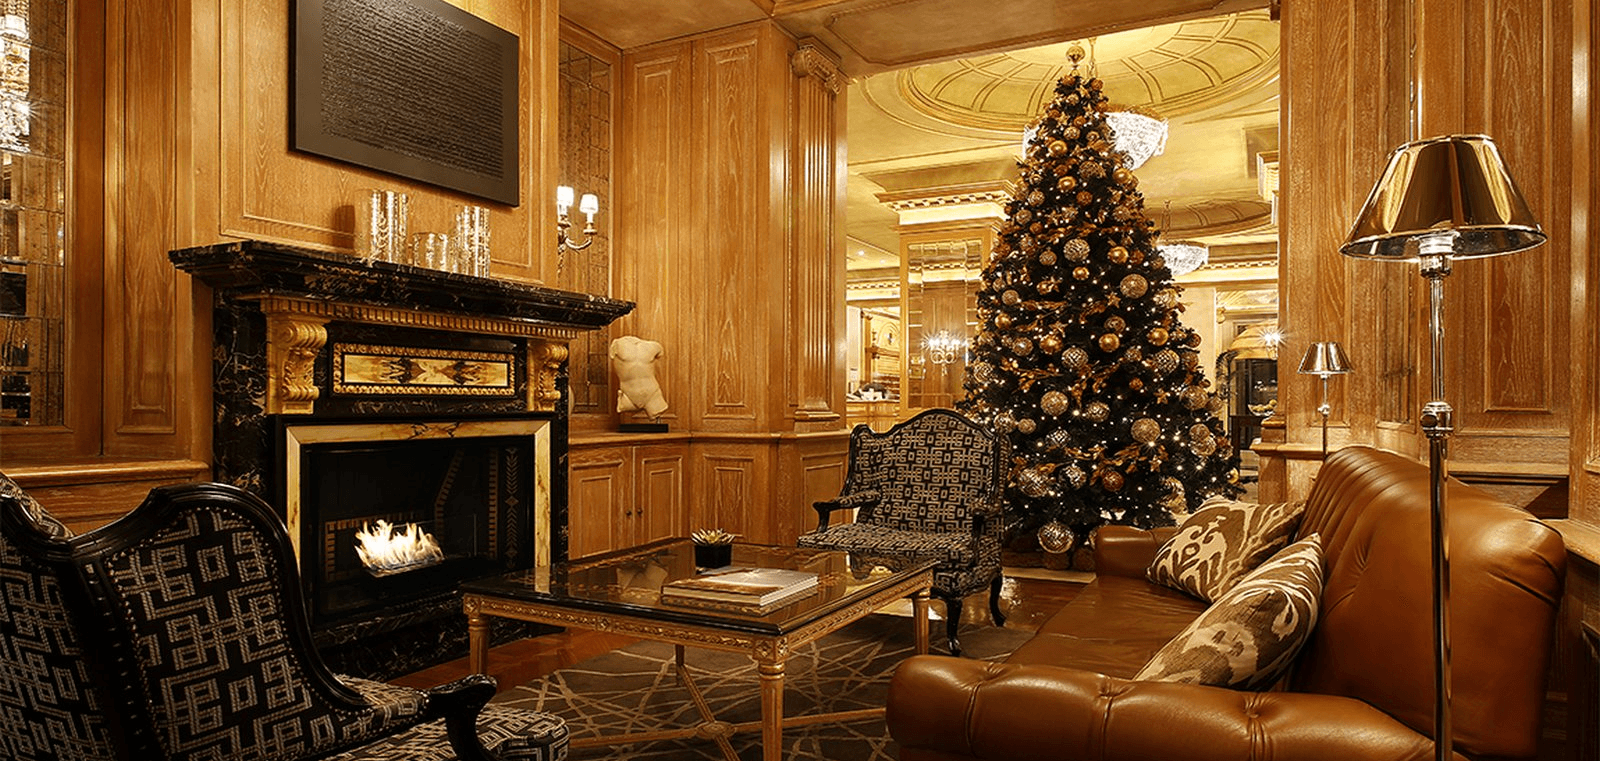 Christmas tree inside room